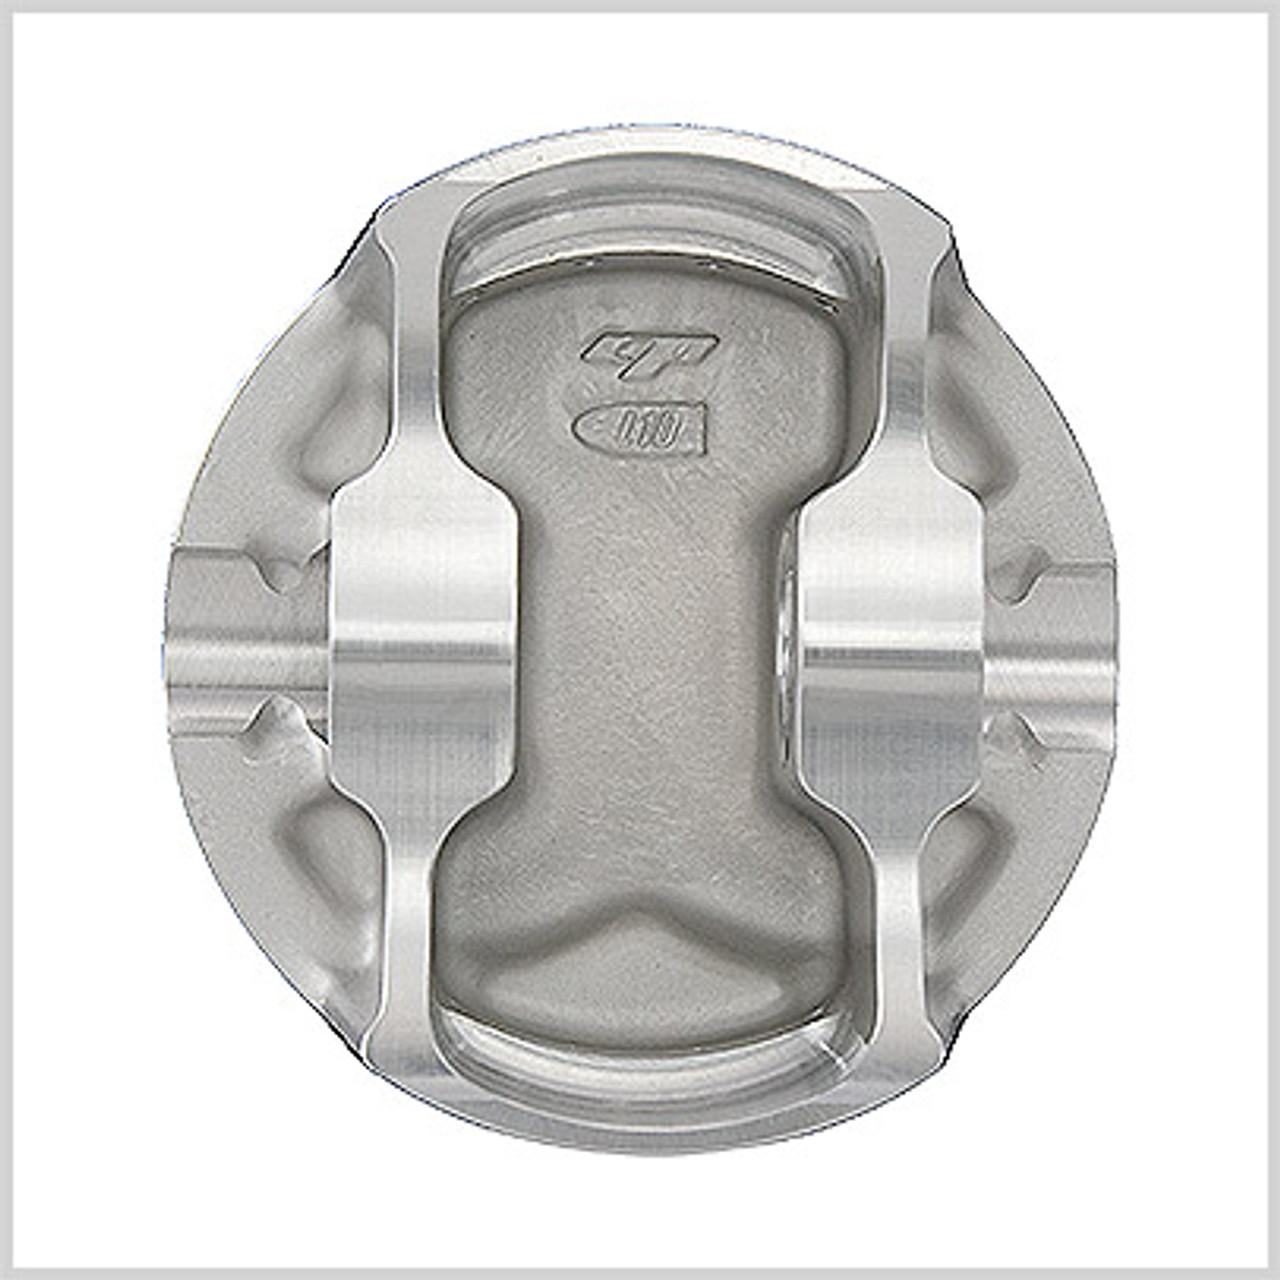 "Carillo CP Bullet LS 4.075"" Pistons Set | 3.622"" Stroke 14.5cc Dish Top | POWER ADDER"